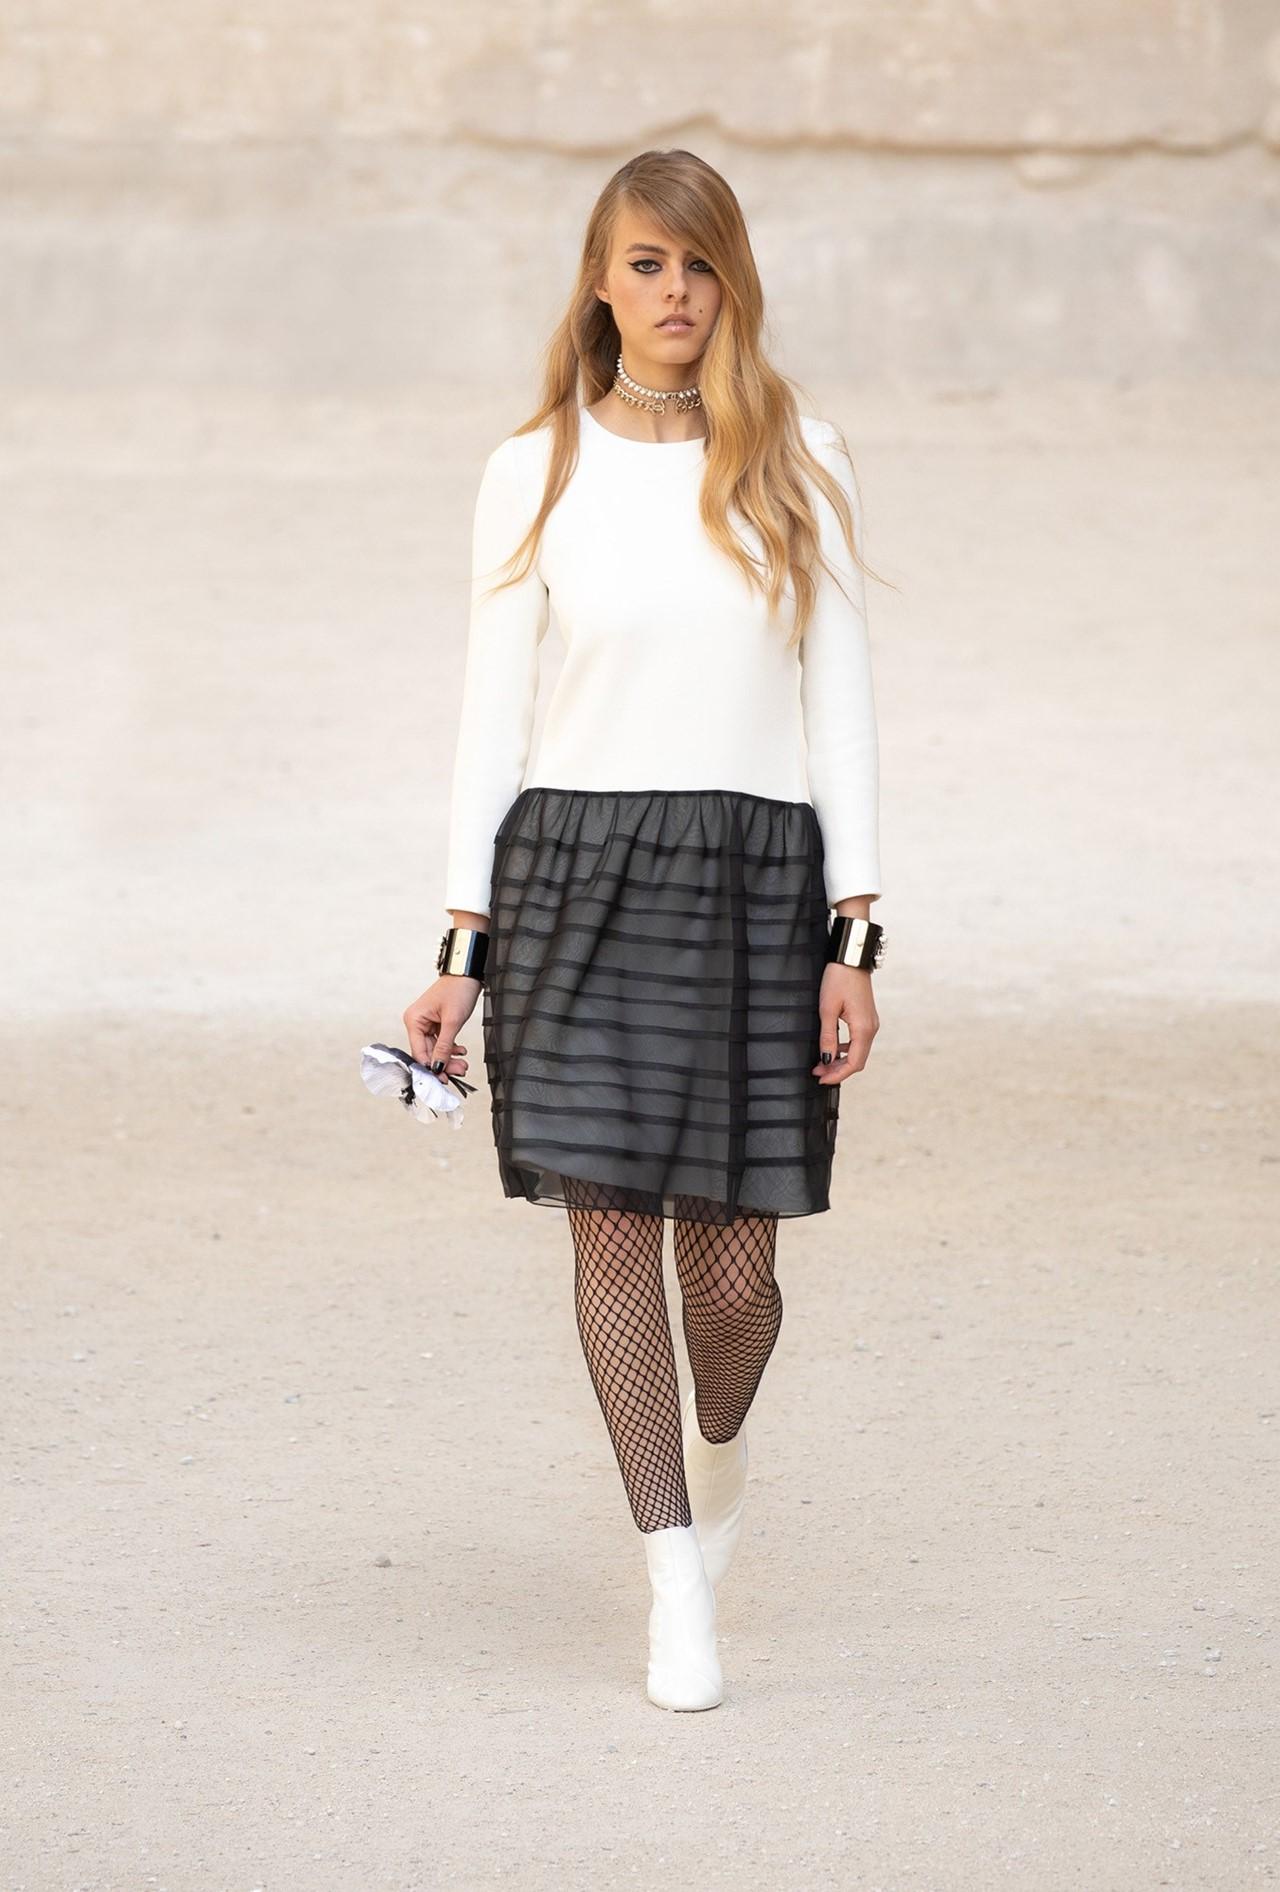 Chanel_Cruise_2022_Fashionela (61)